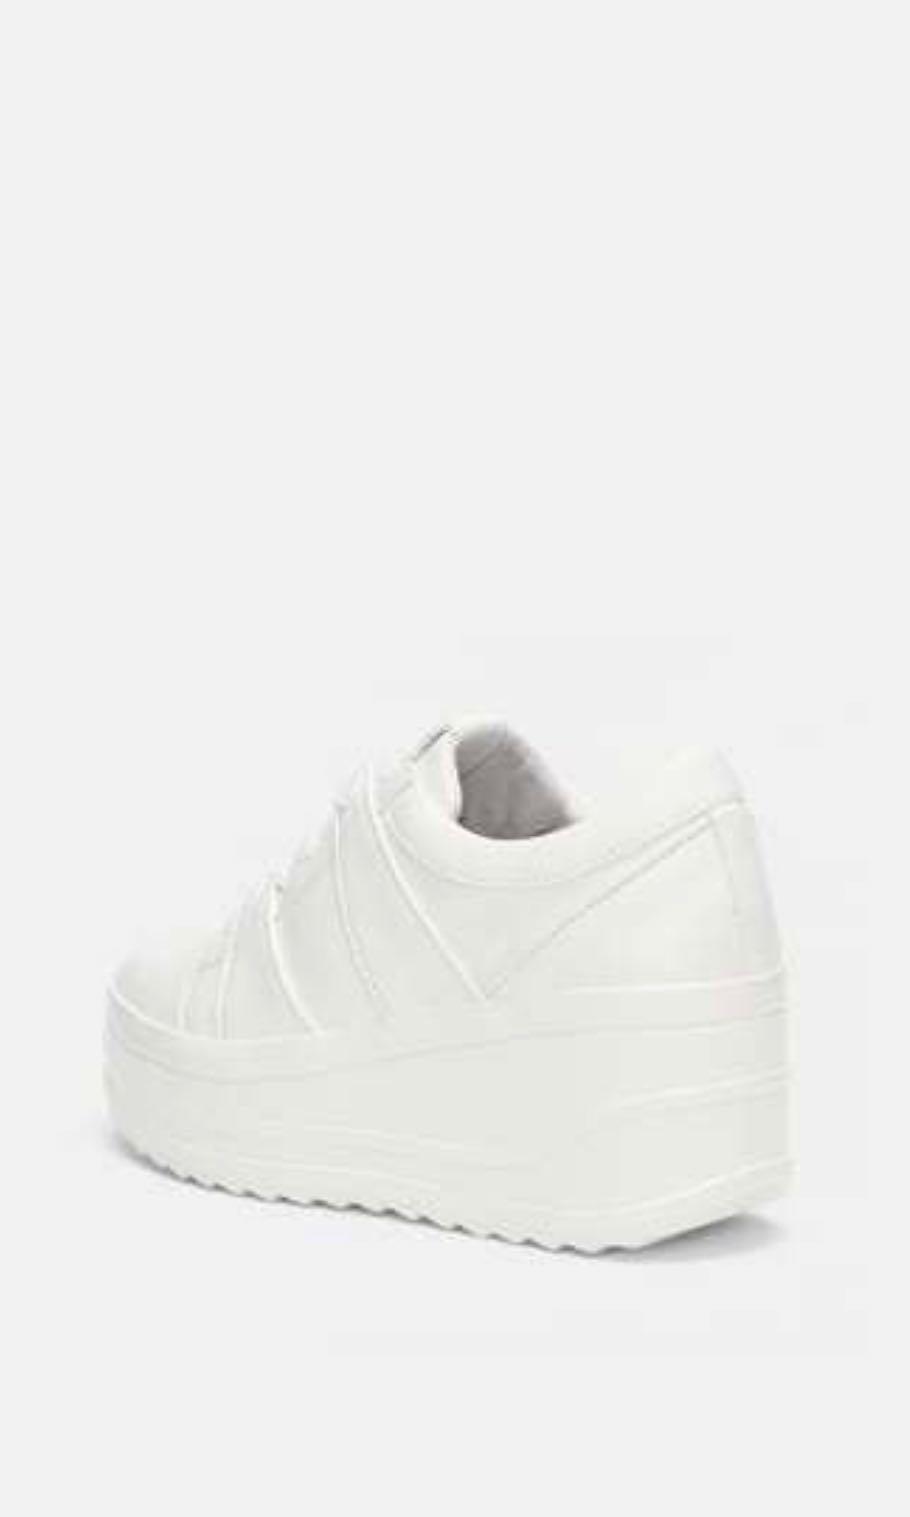 ZARA White Platform Sneakers, Women's